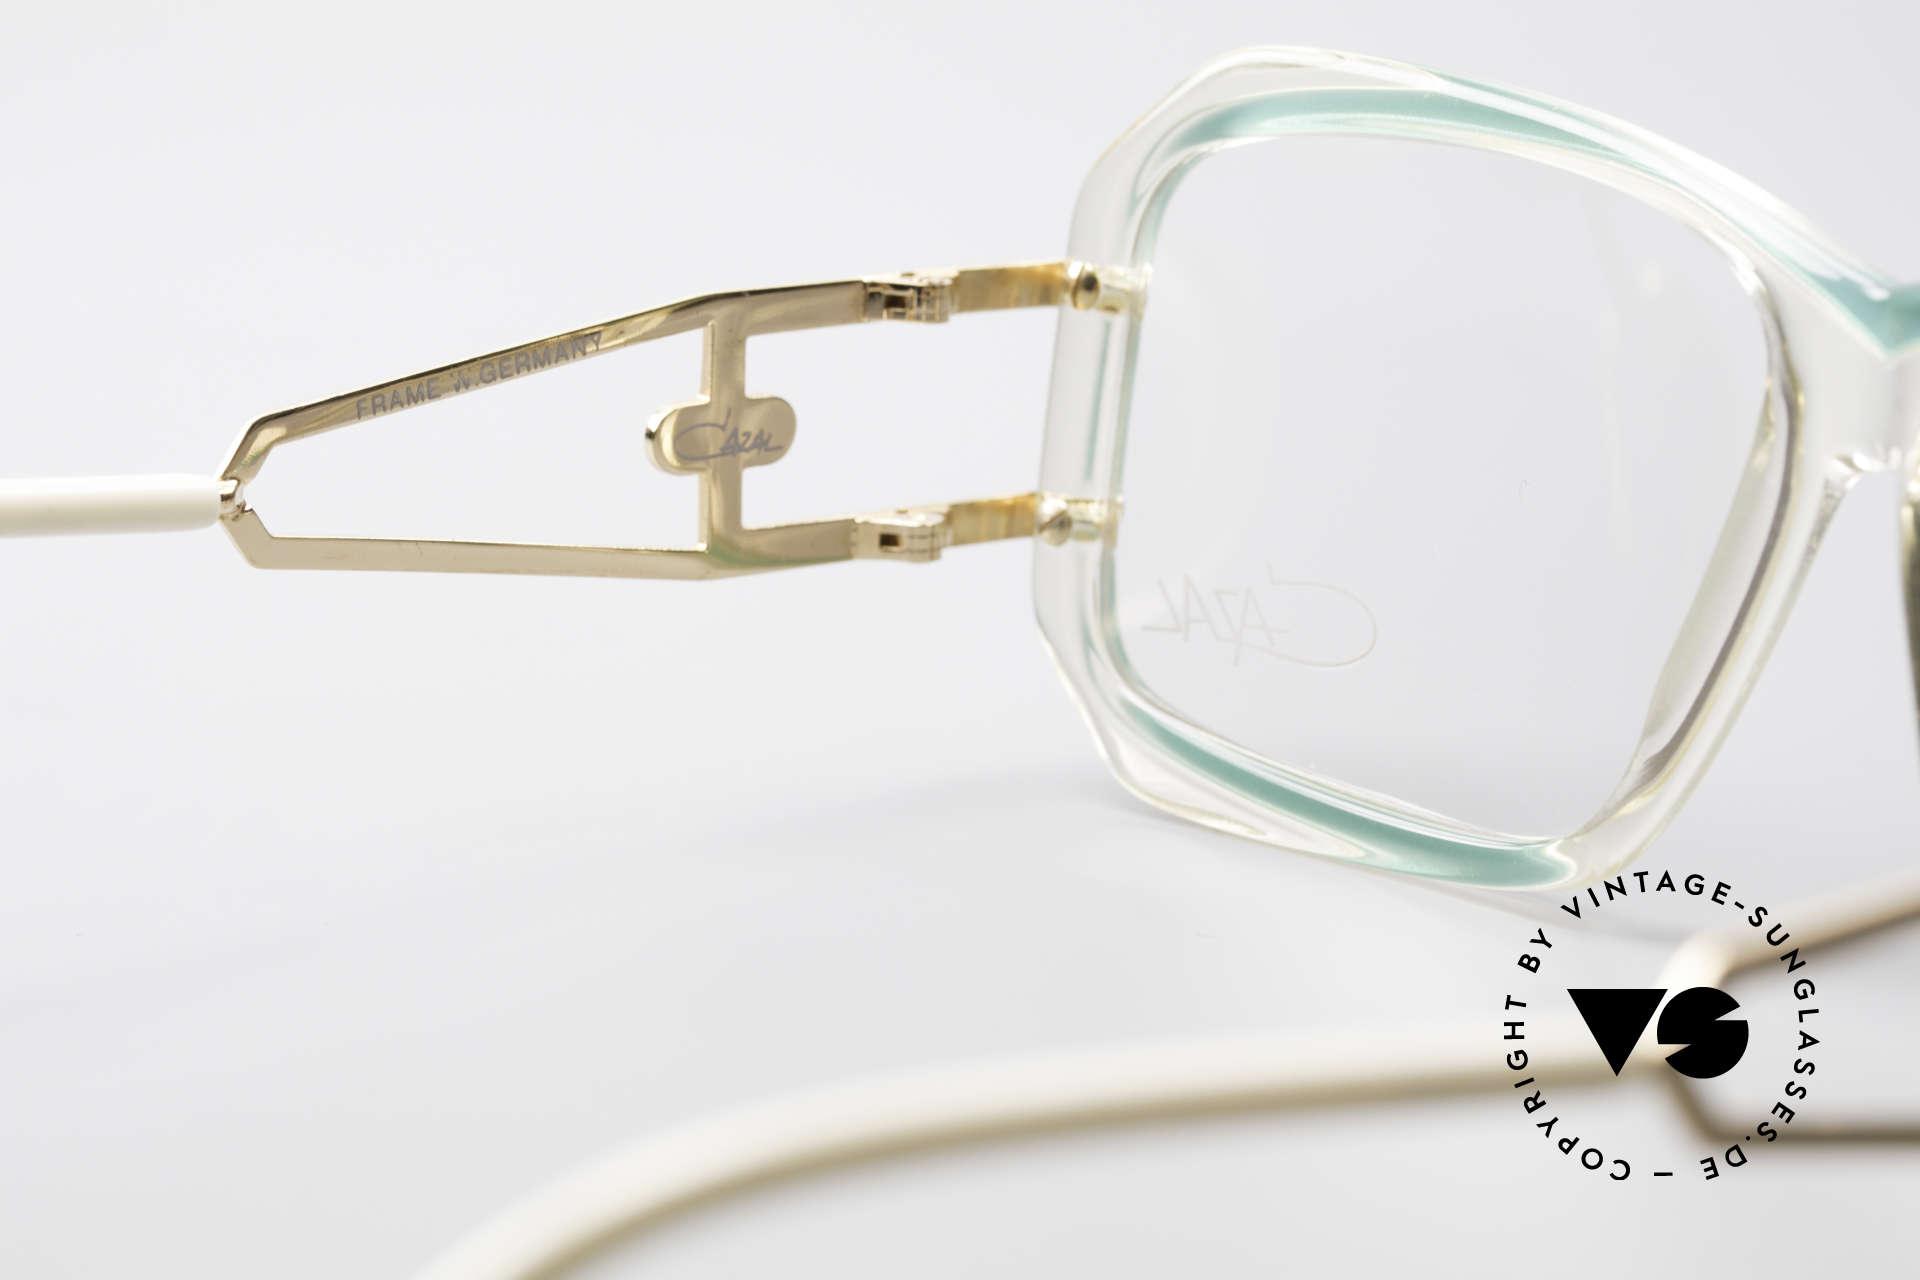 Cazal 173 Hip Hop Cazal 80's Glasses, original DEMO lenses can be replaced optionally, Made for Women